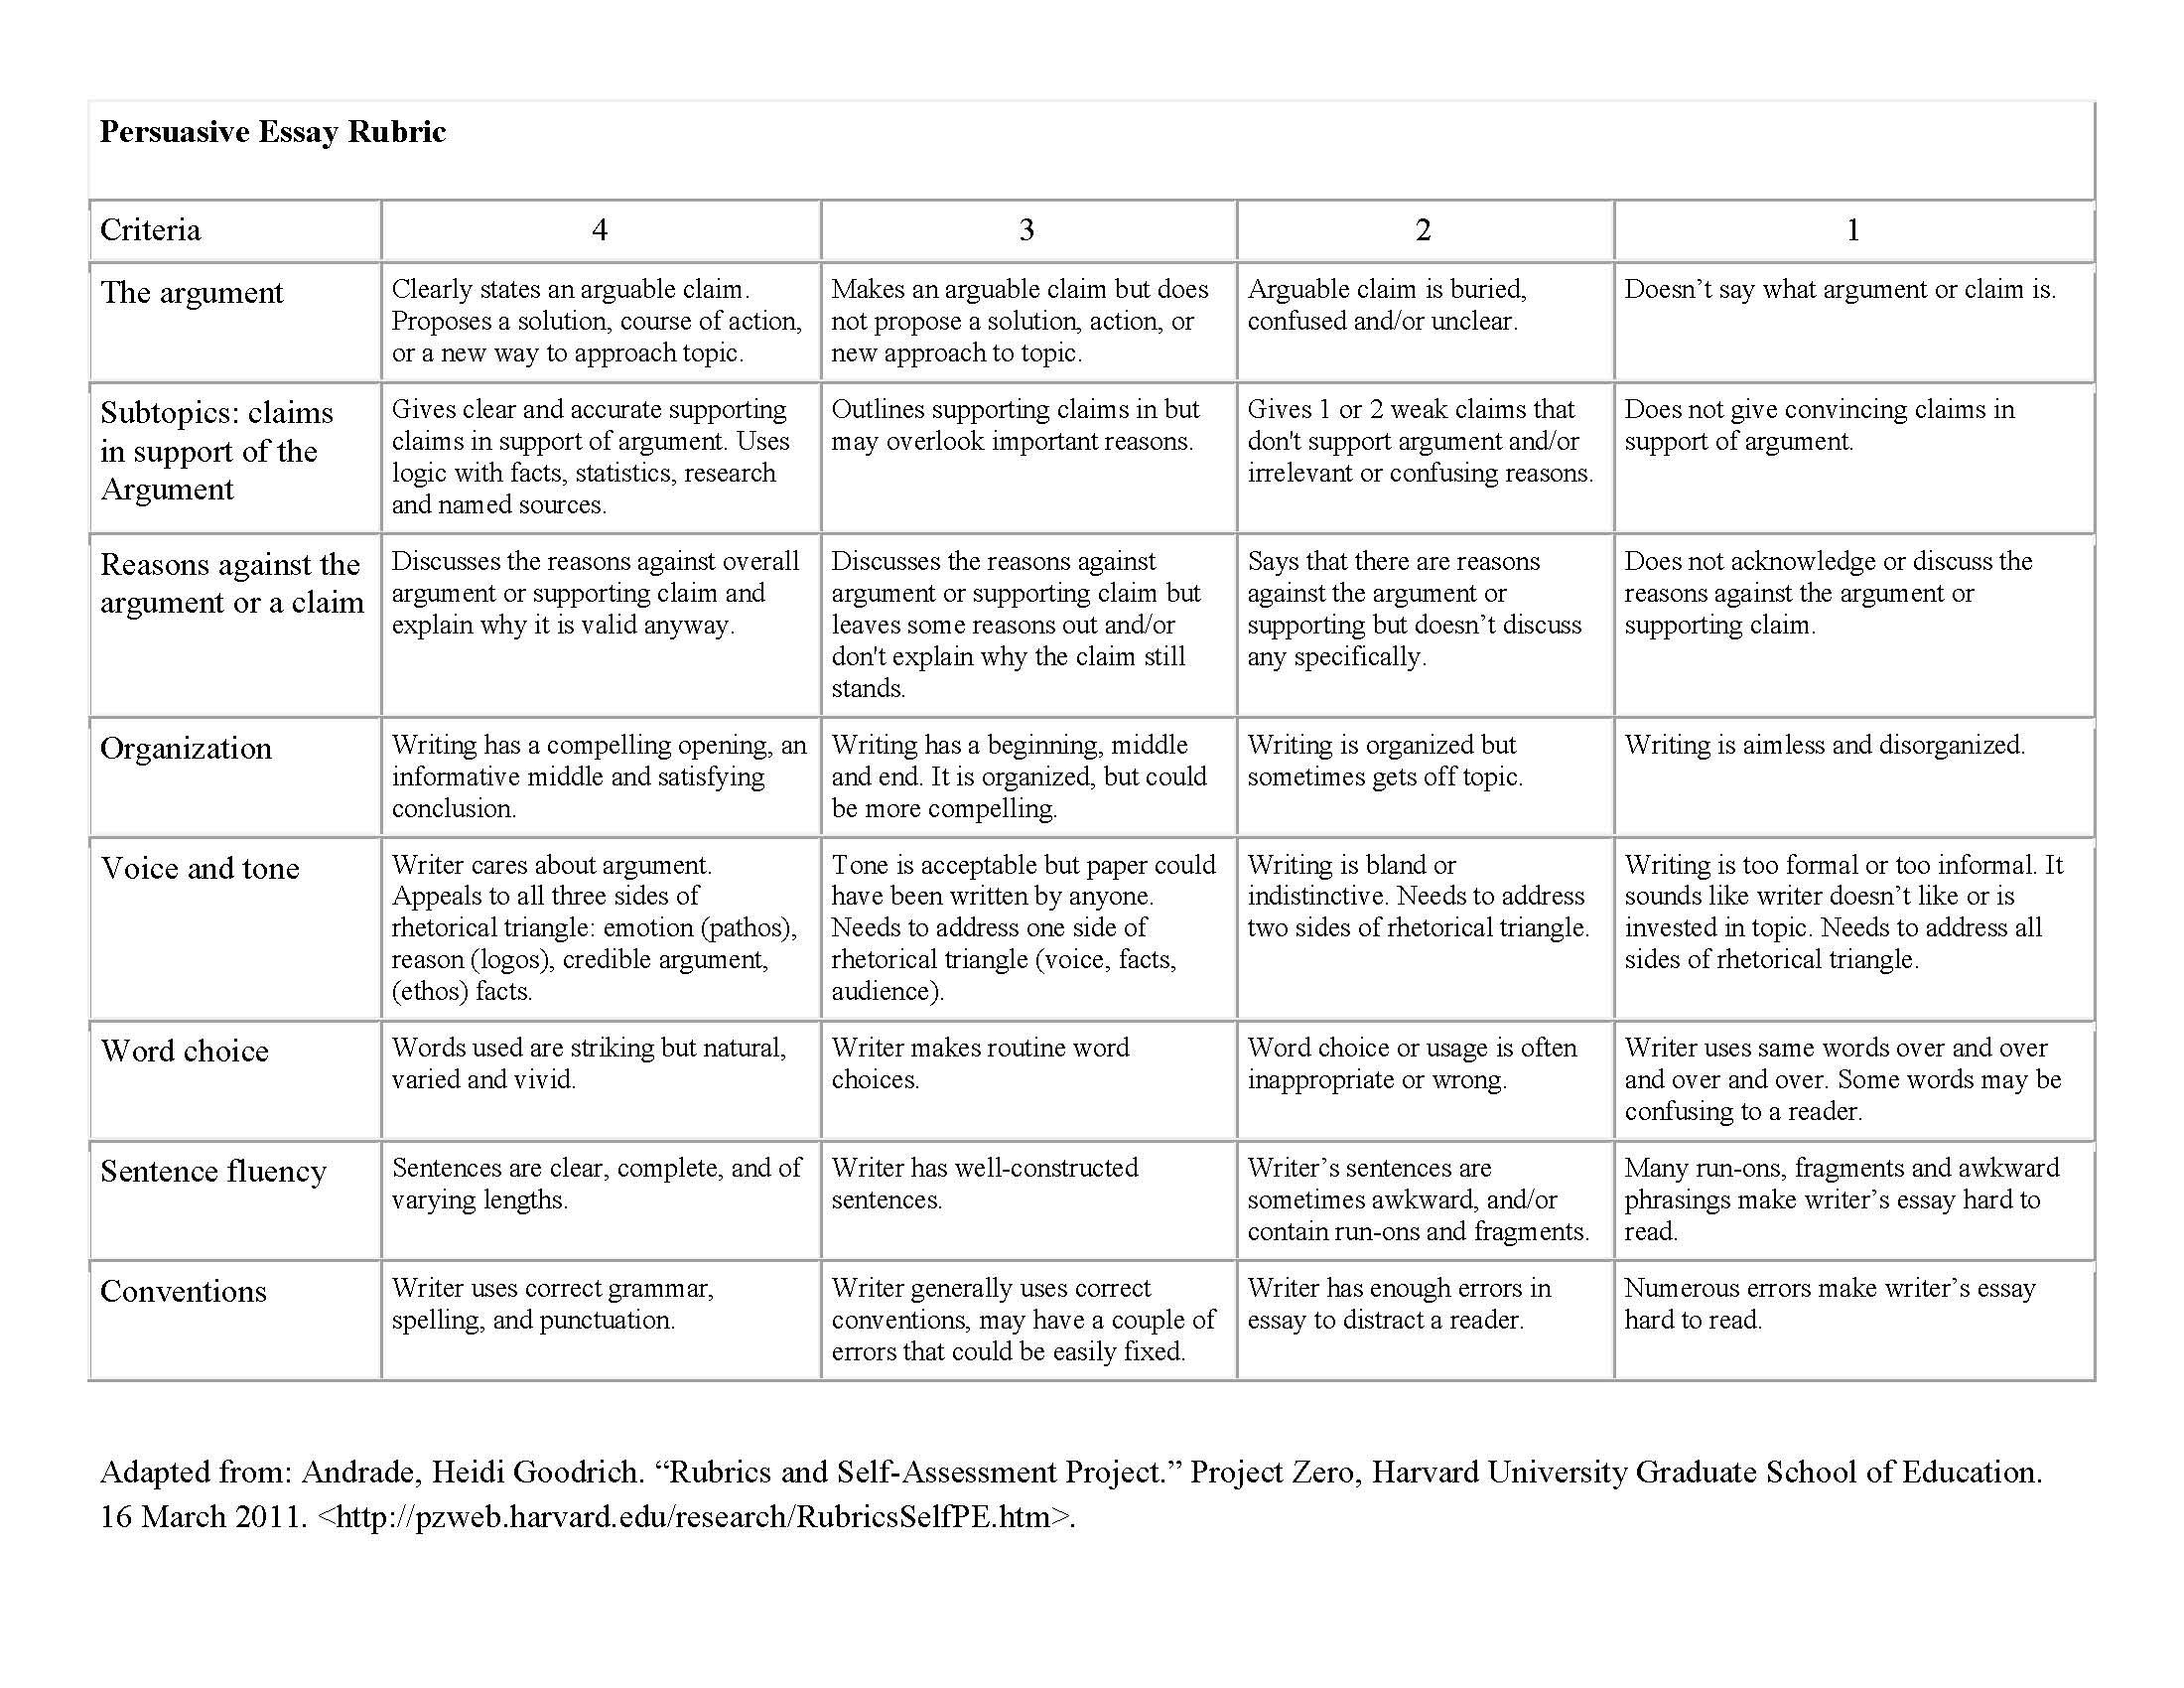 024 Handout Persuasive Essay Rubriccbu003d Example Argumentative Rare Prompts Topics For 7th Graders College High School Pdf Full